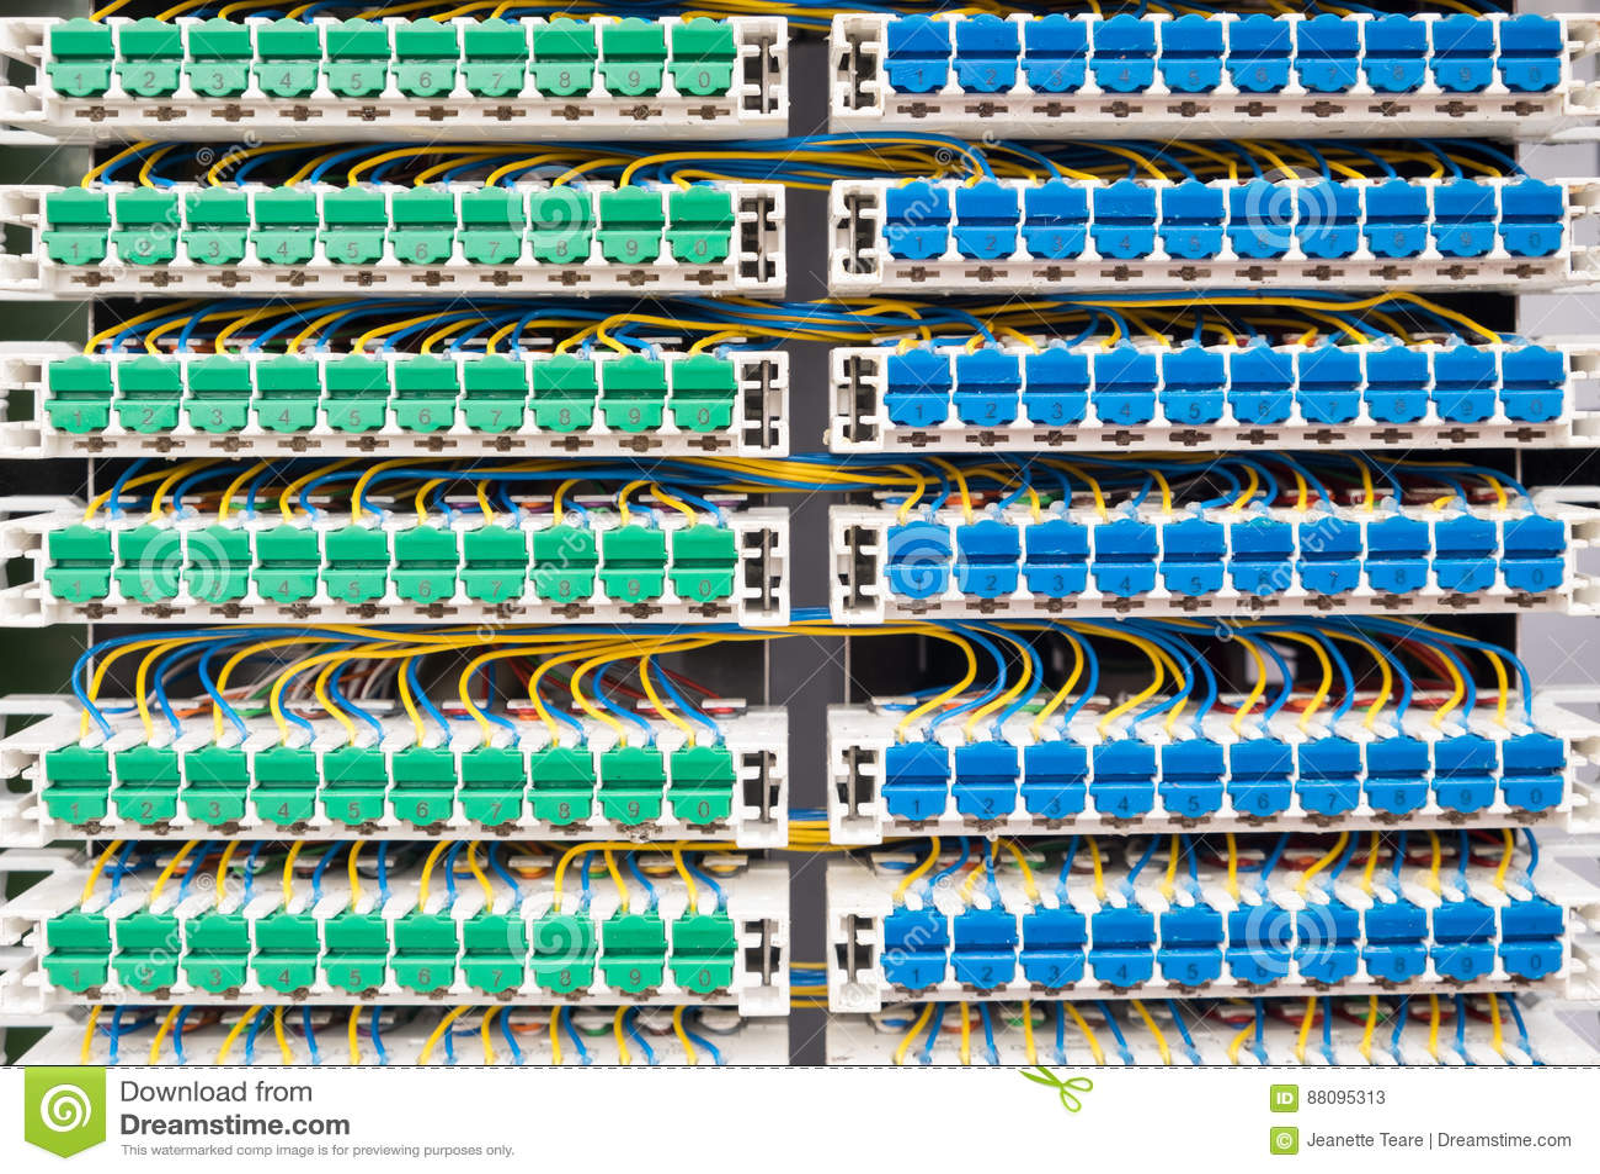 Verdrahtung Im Breitbandkabinett Stockbild - Bild von breitband ...